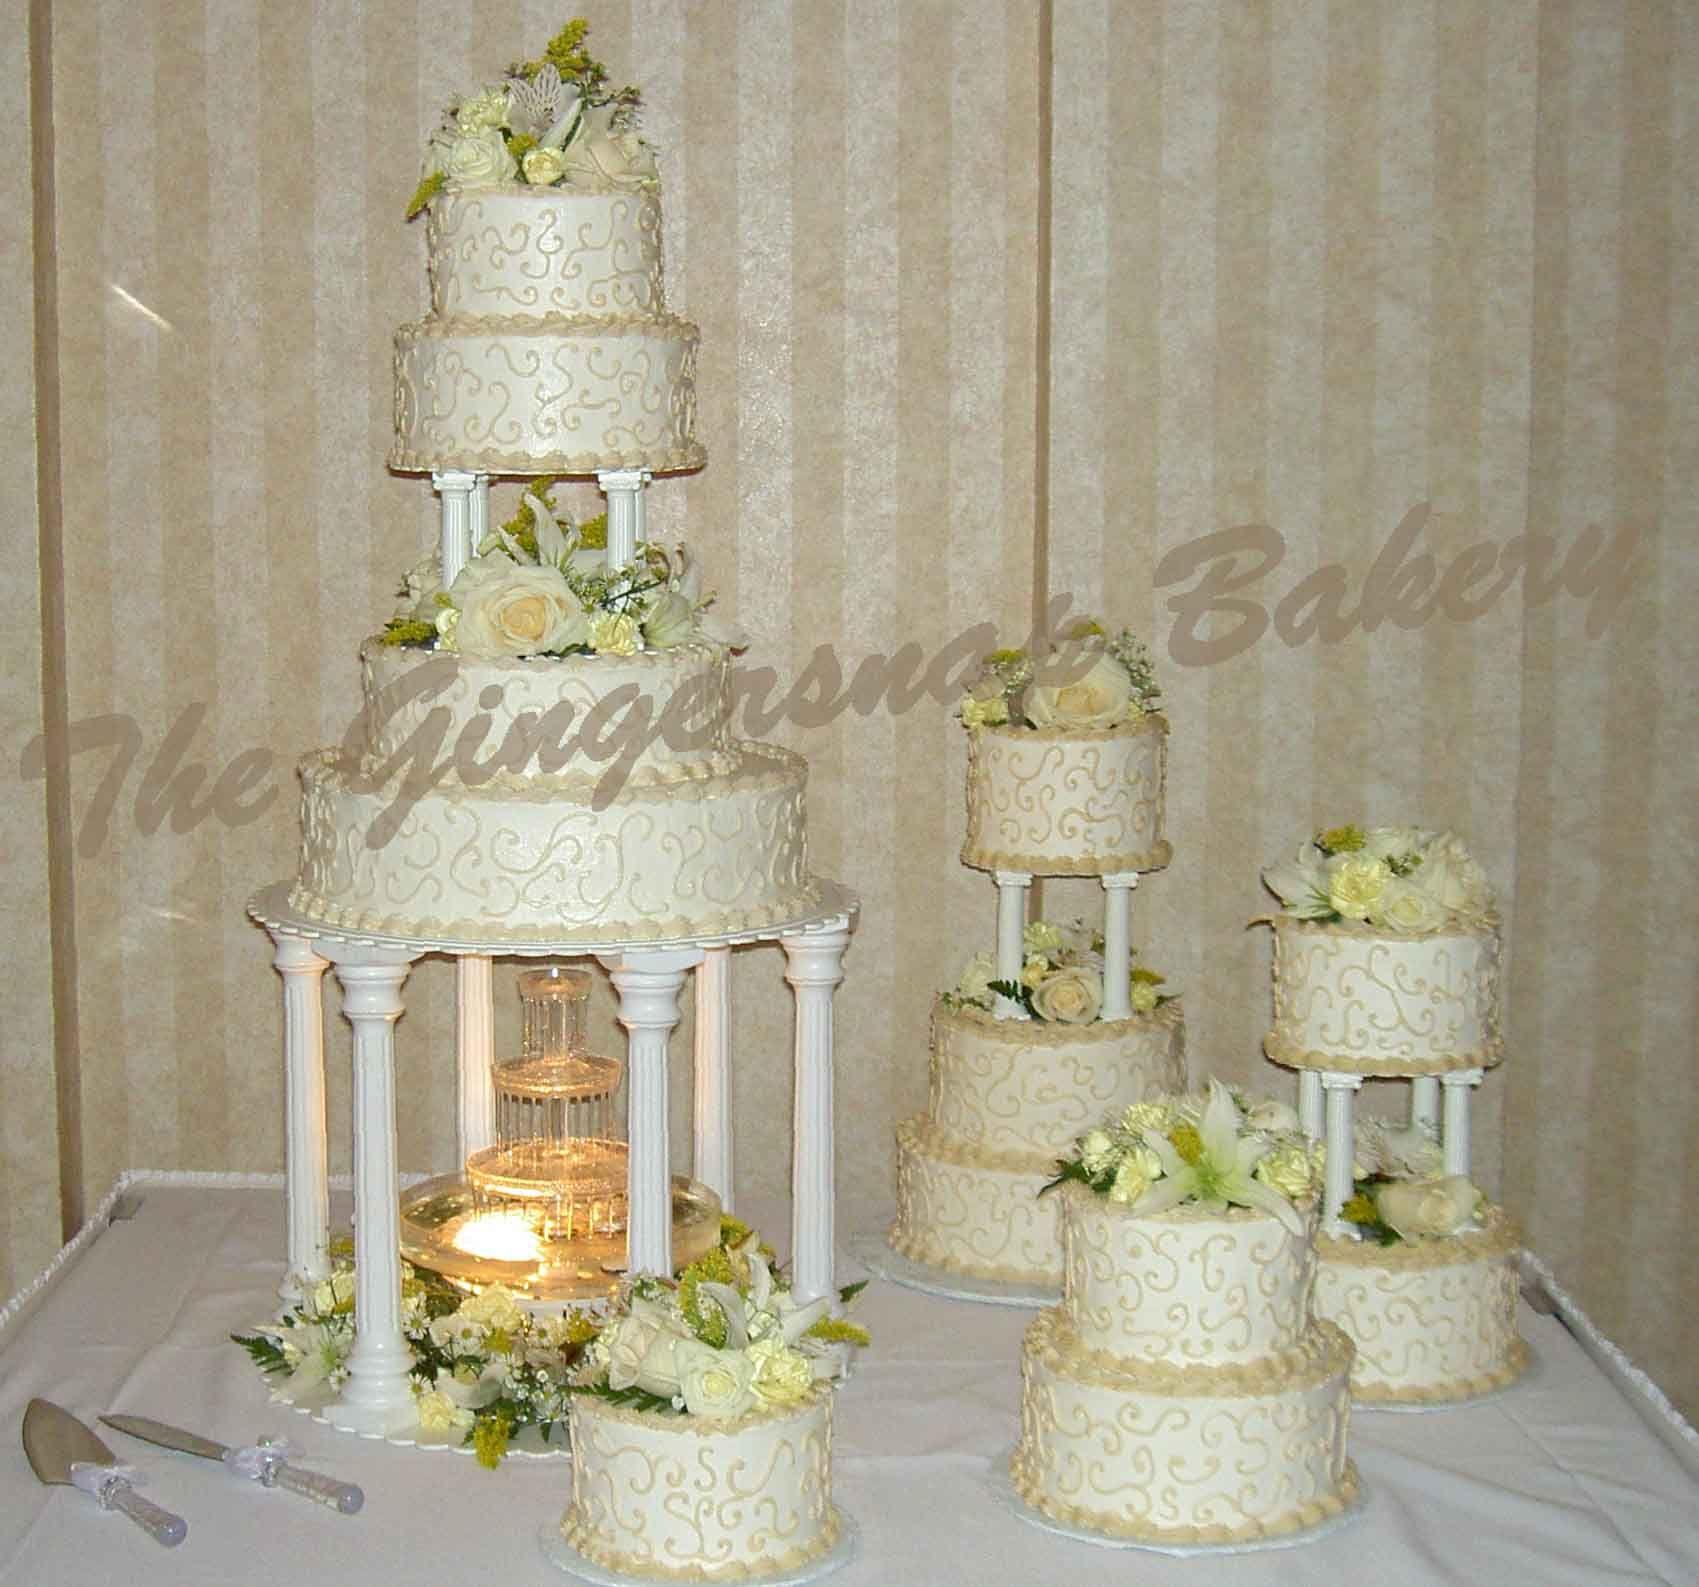 Wedding Cakes with Fountains wedding cakes fountains to